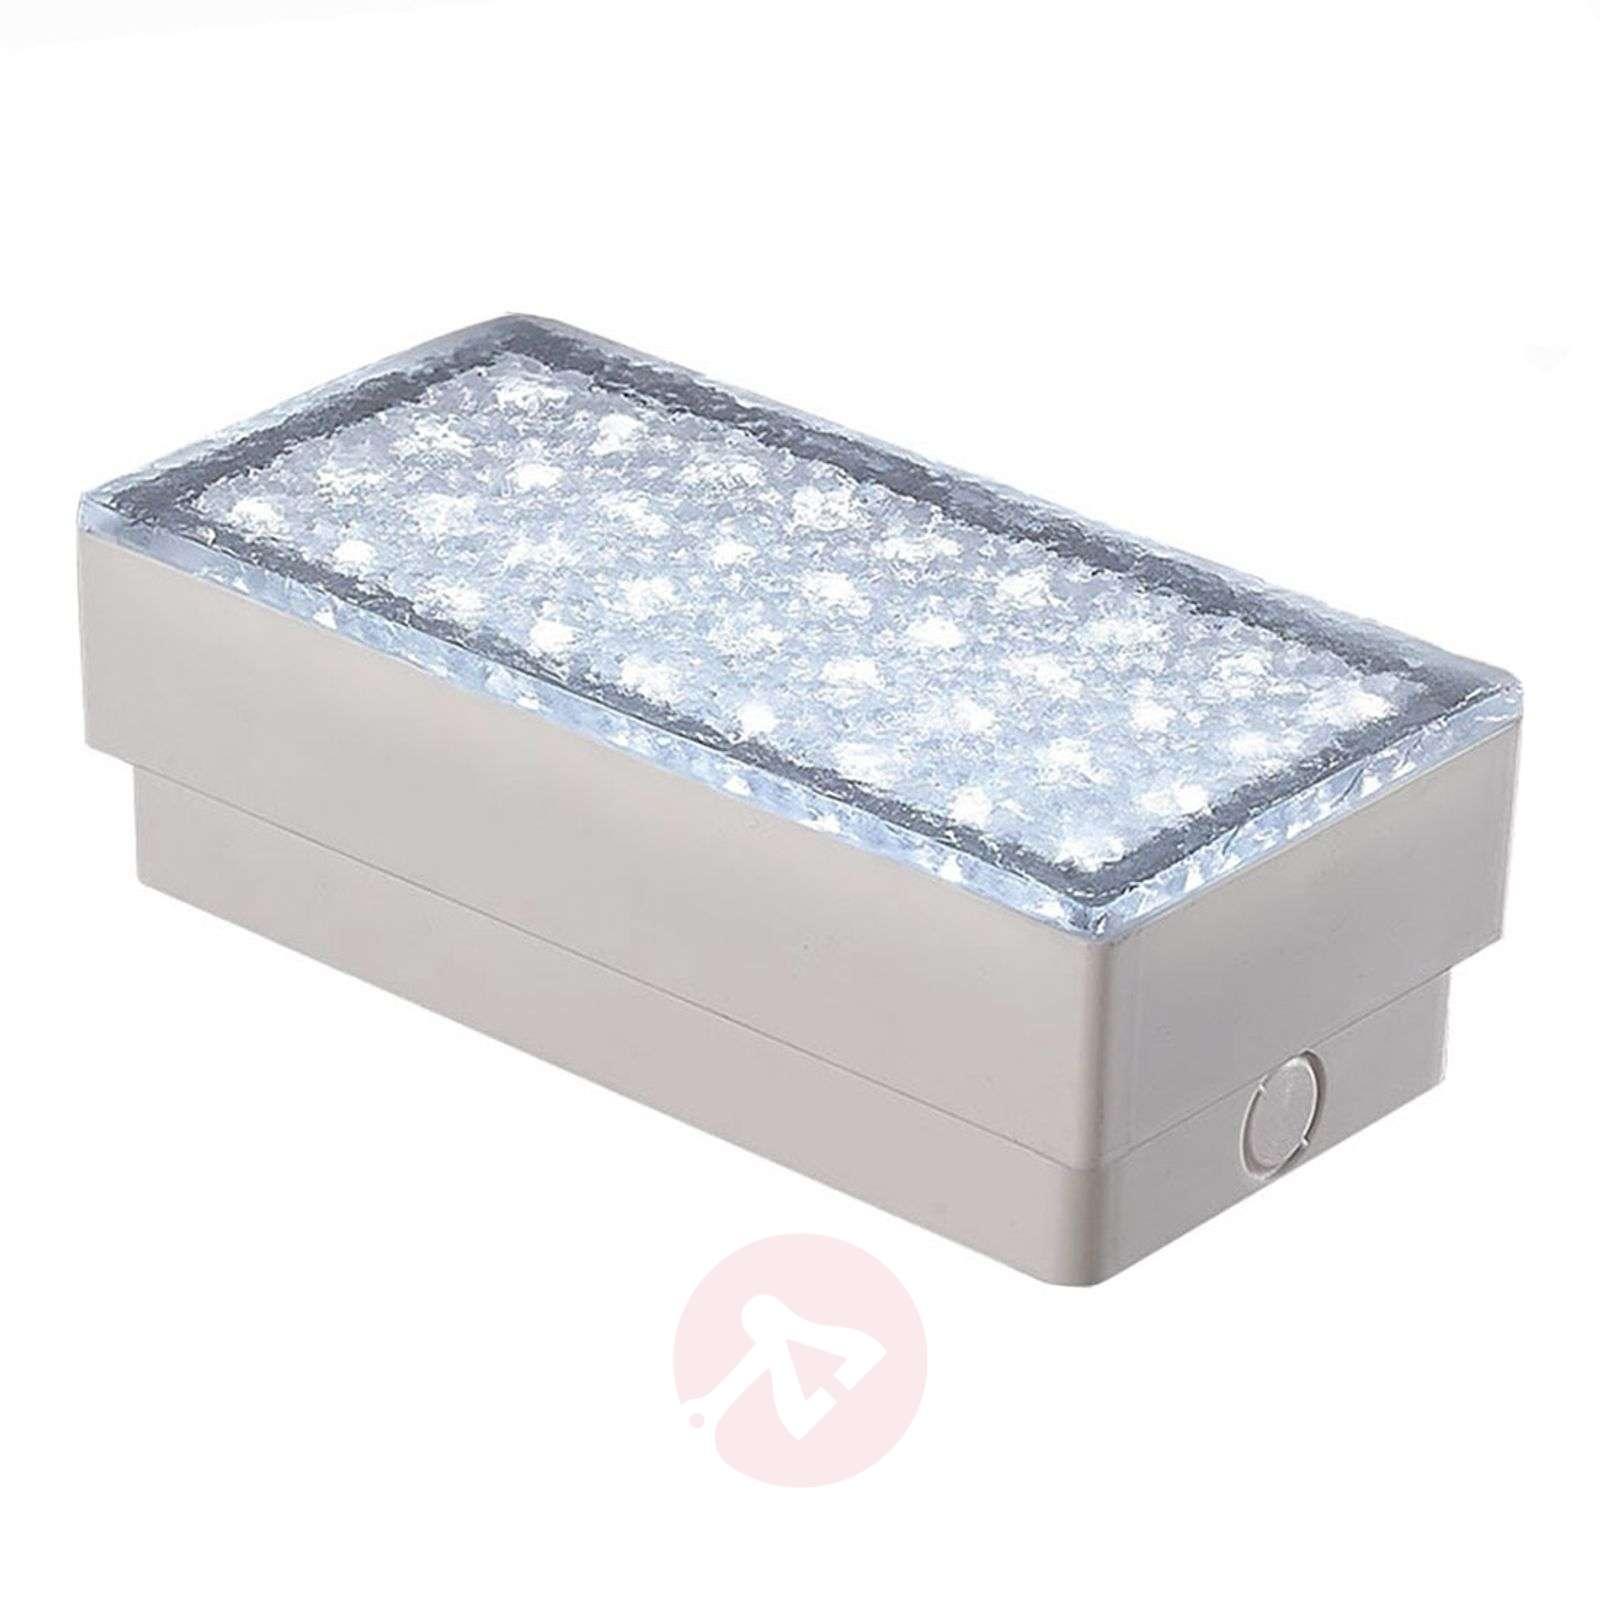 Arcchio Ewgenie LED-lattiauppovalaisin-9934016X-01